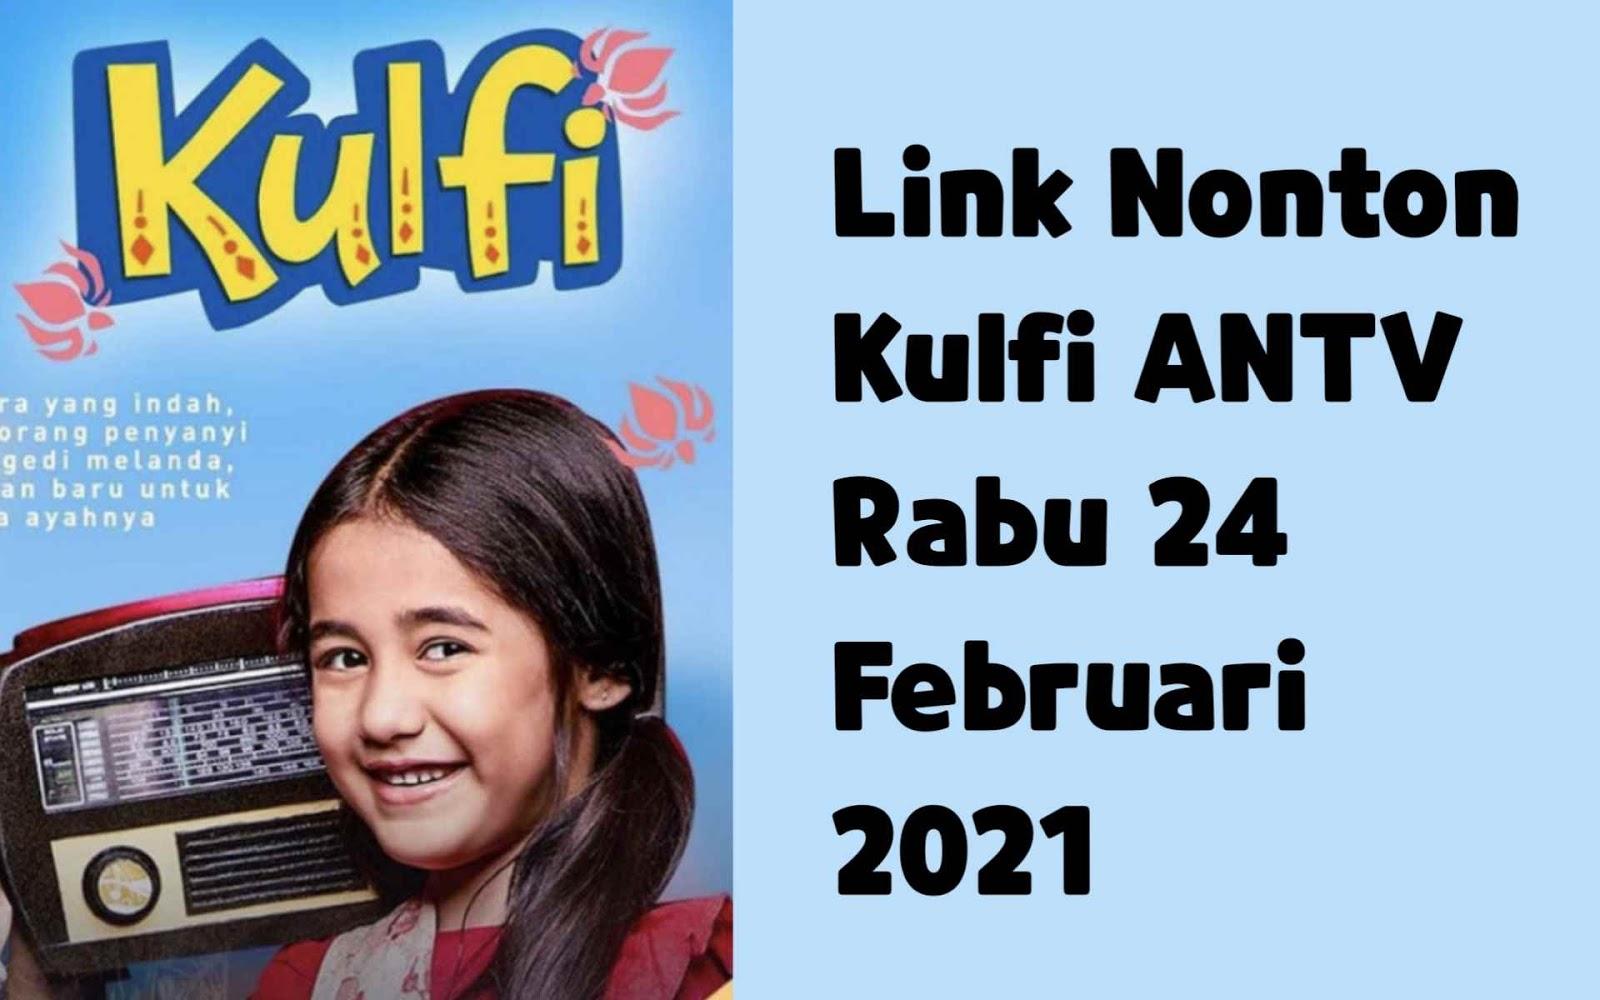 Link Nonton Kulfi ANTV Rabu 24 Februari 2021